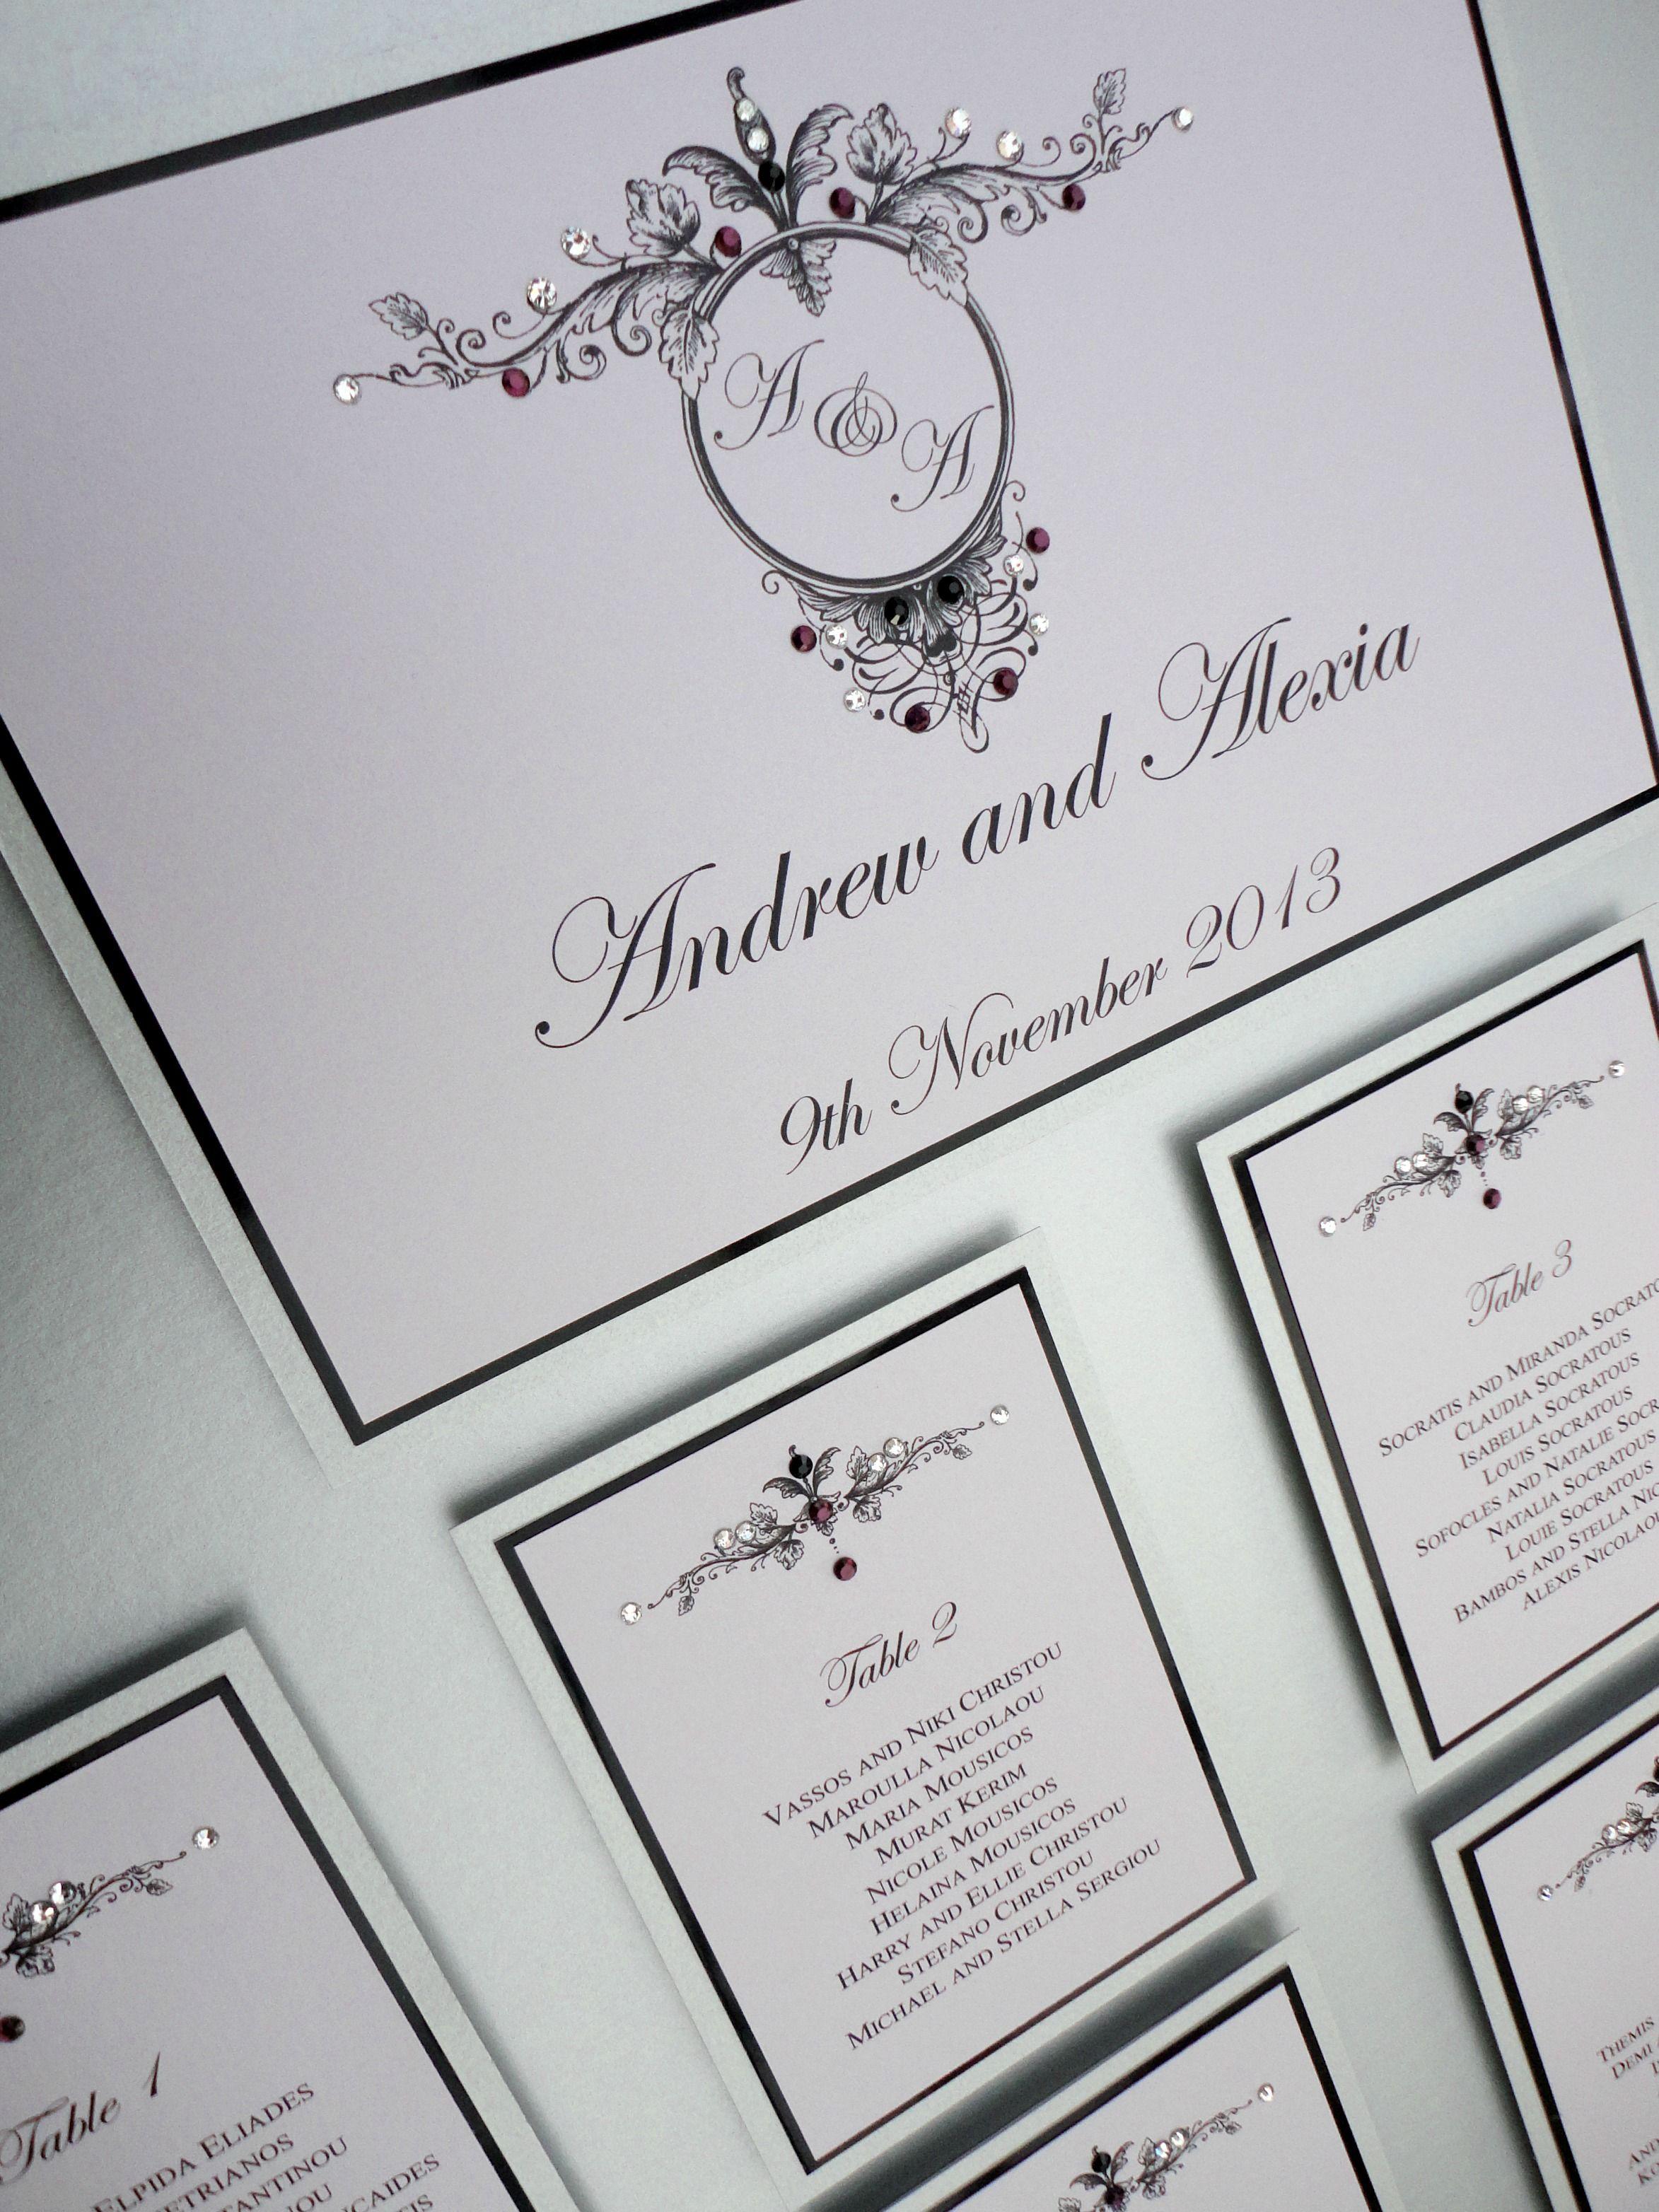 Wedding table plan decorated with Swarovski crystals #wedding ...